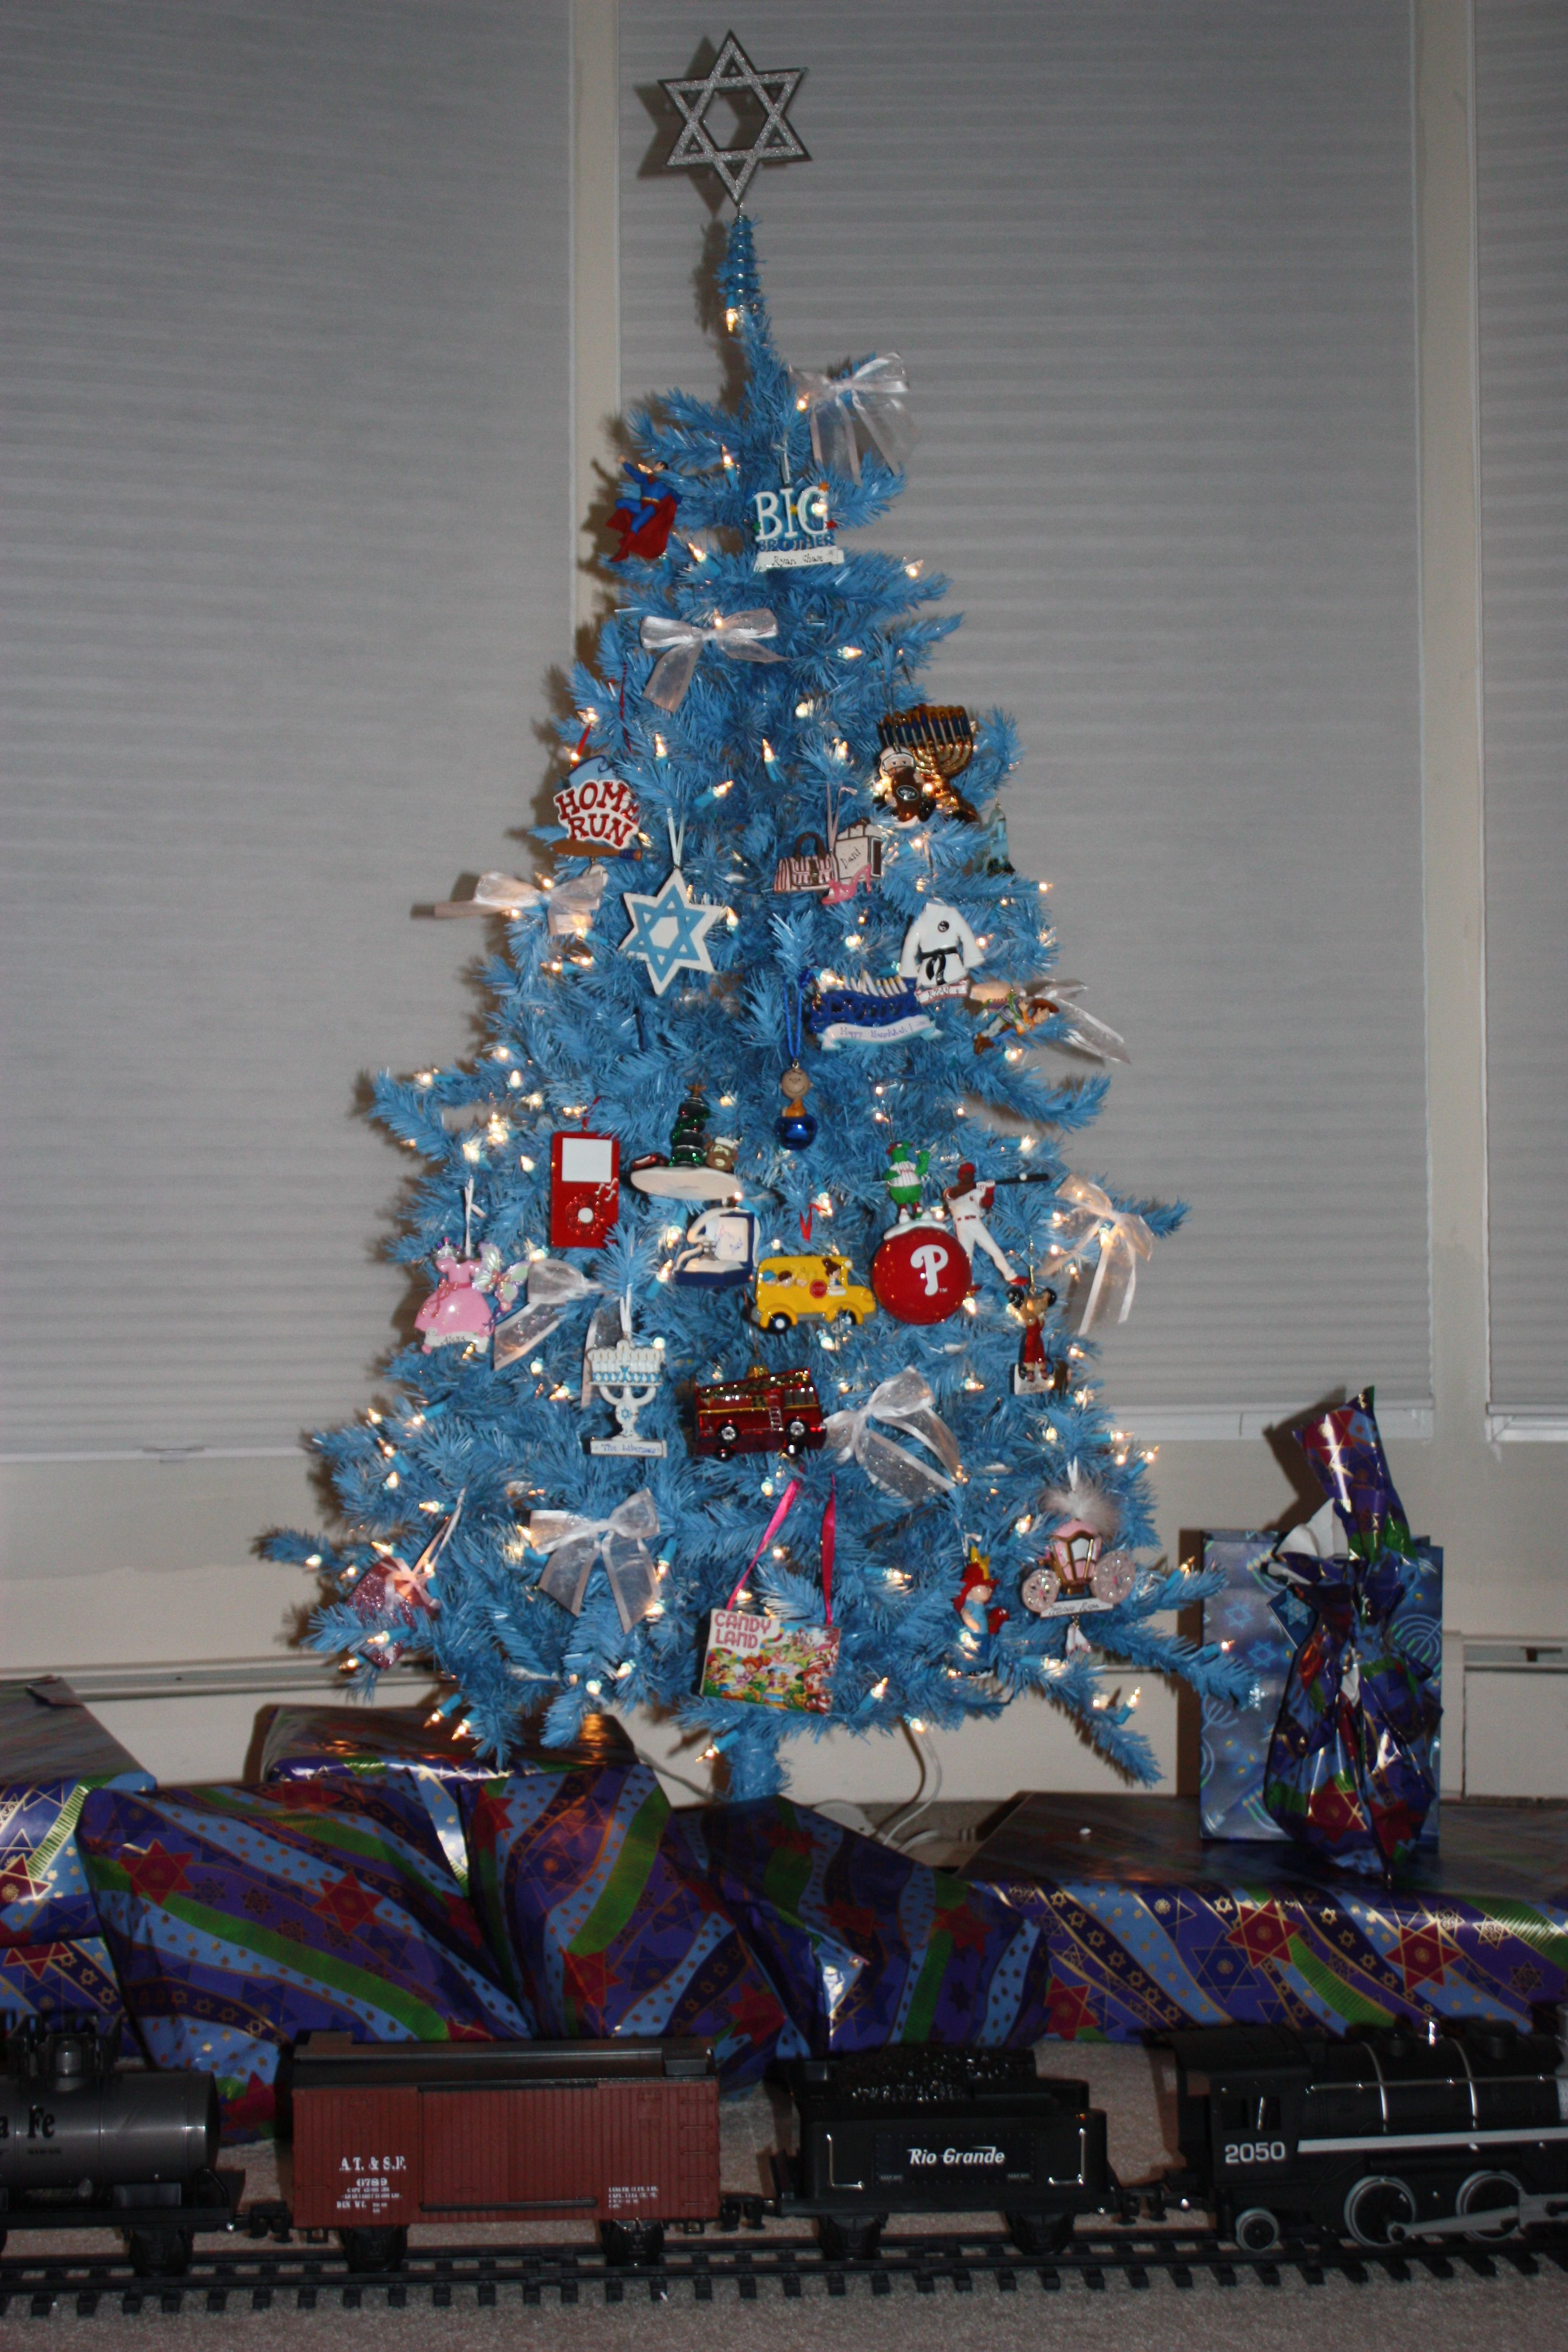 Hanukkah ornaments for a tree - Hanukkah Bush Tree